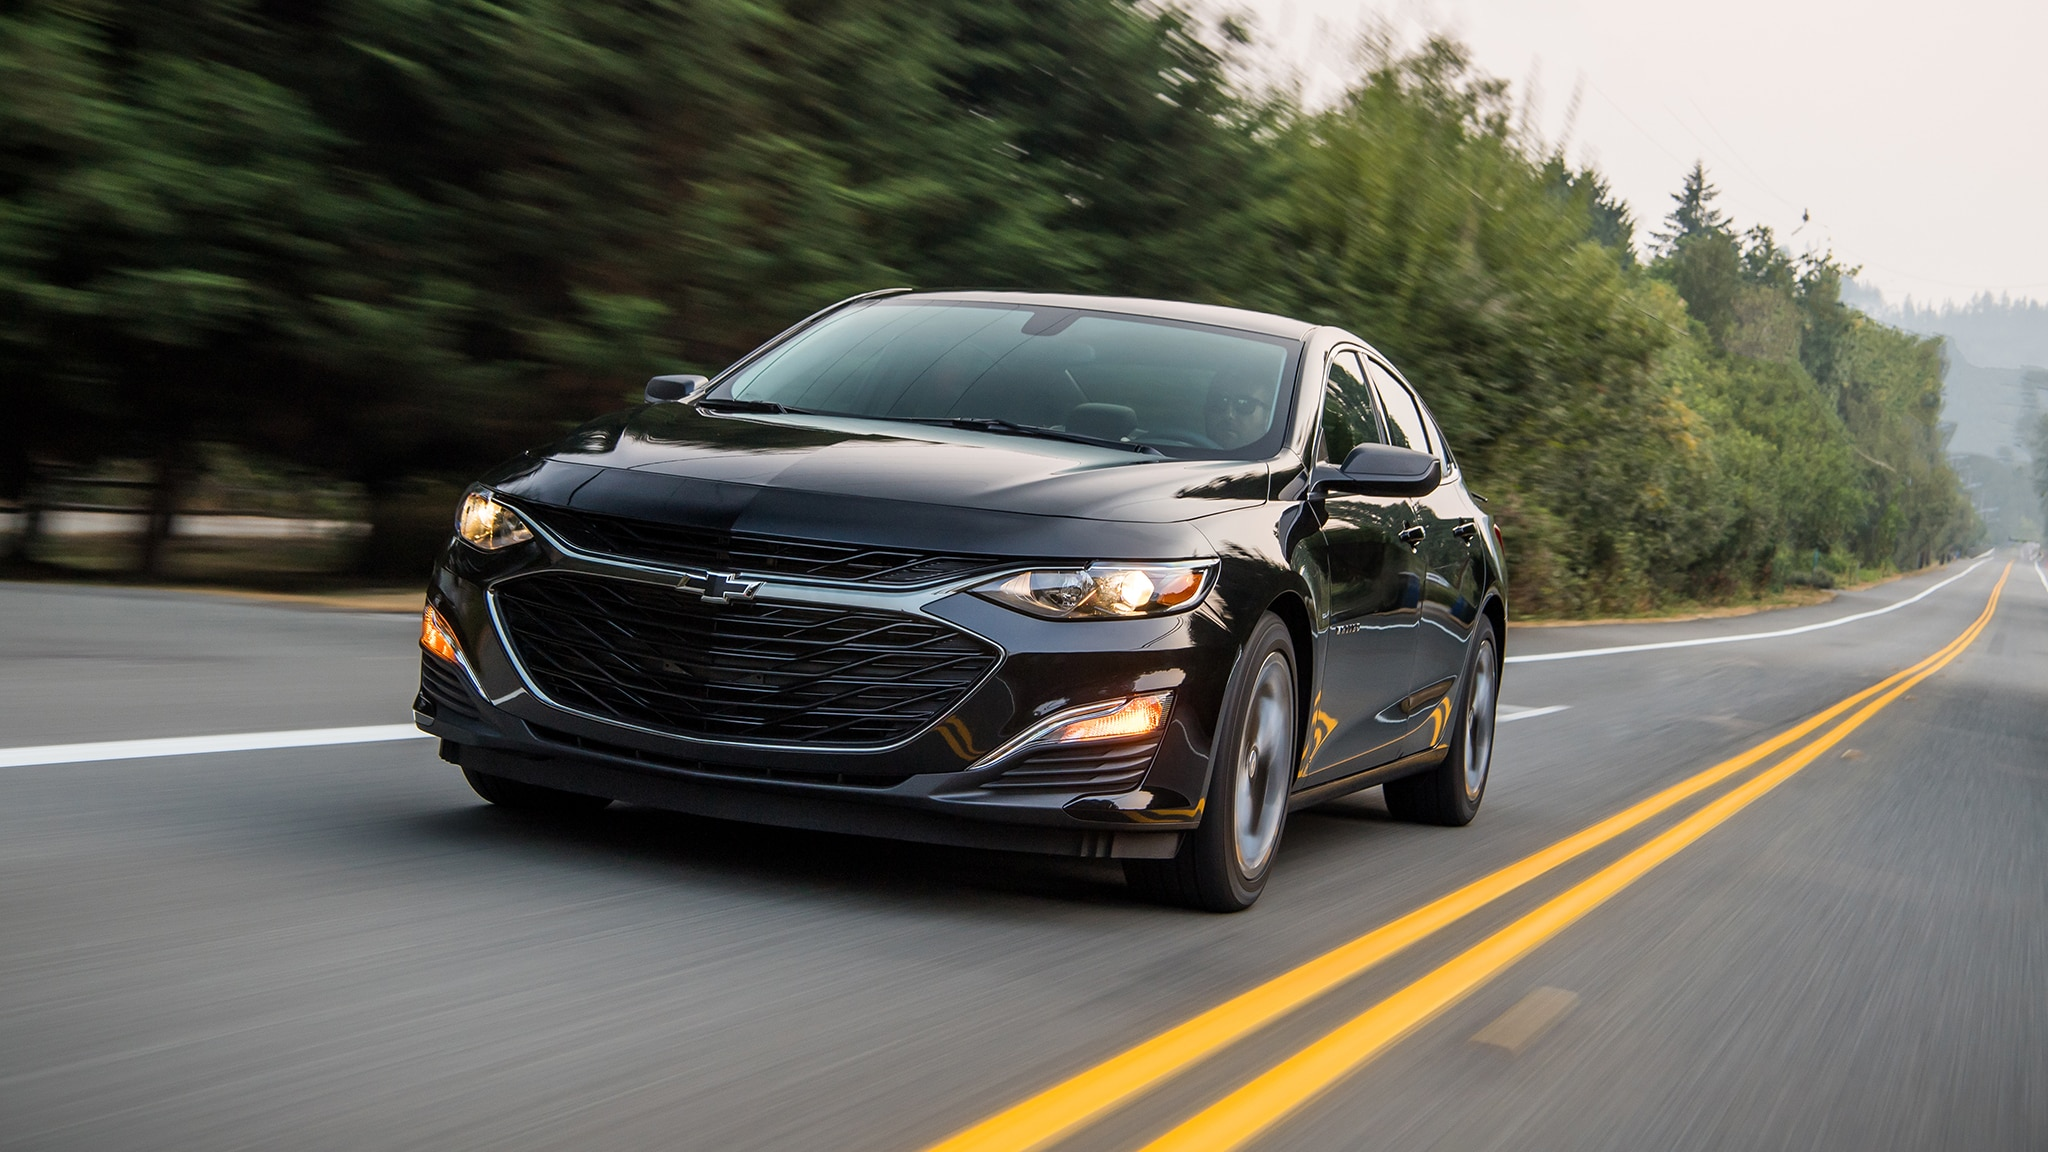 First Drive: 2019 Chevrolet Malibu RS | Automobile Magazine